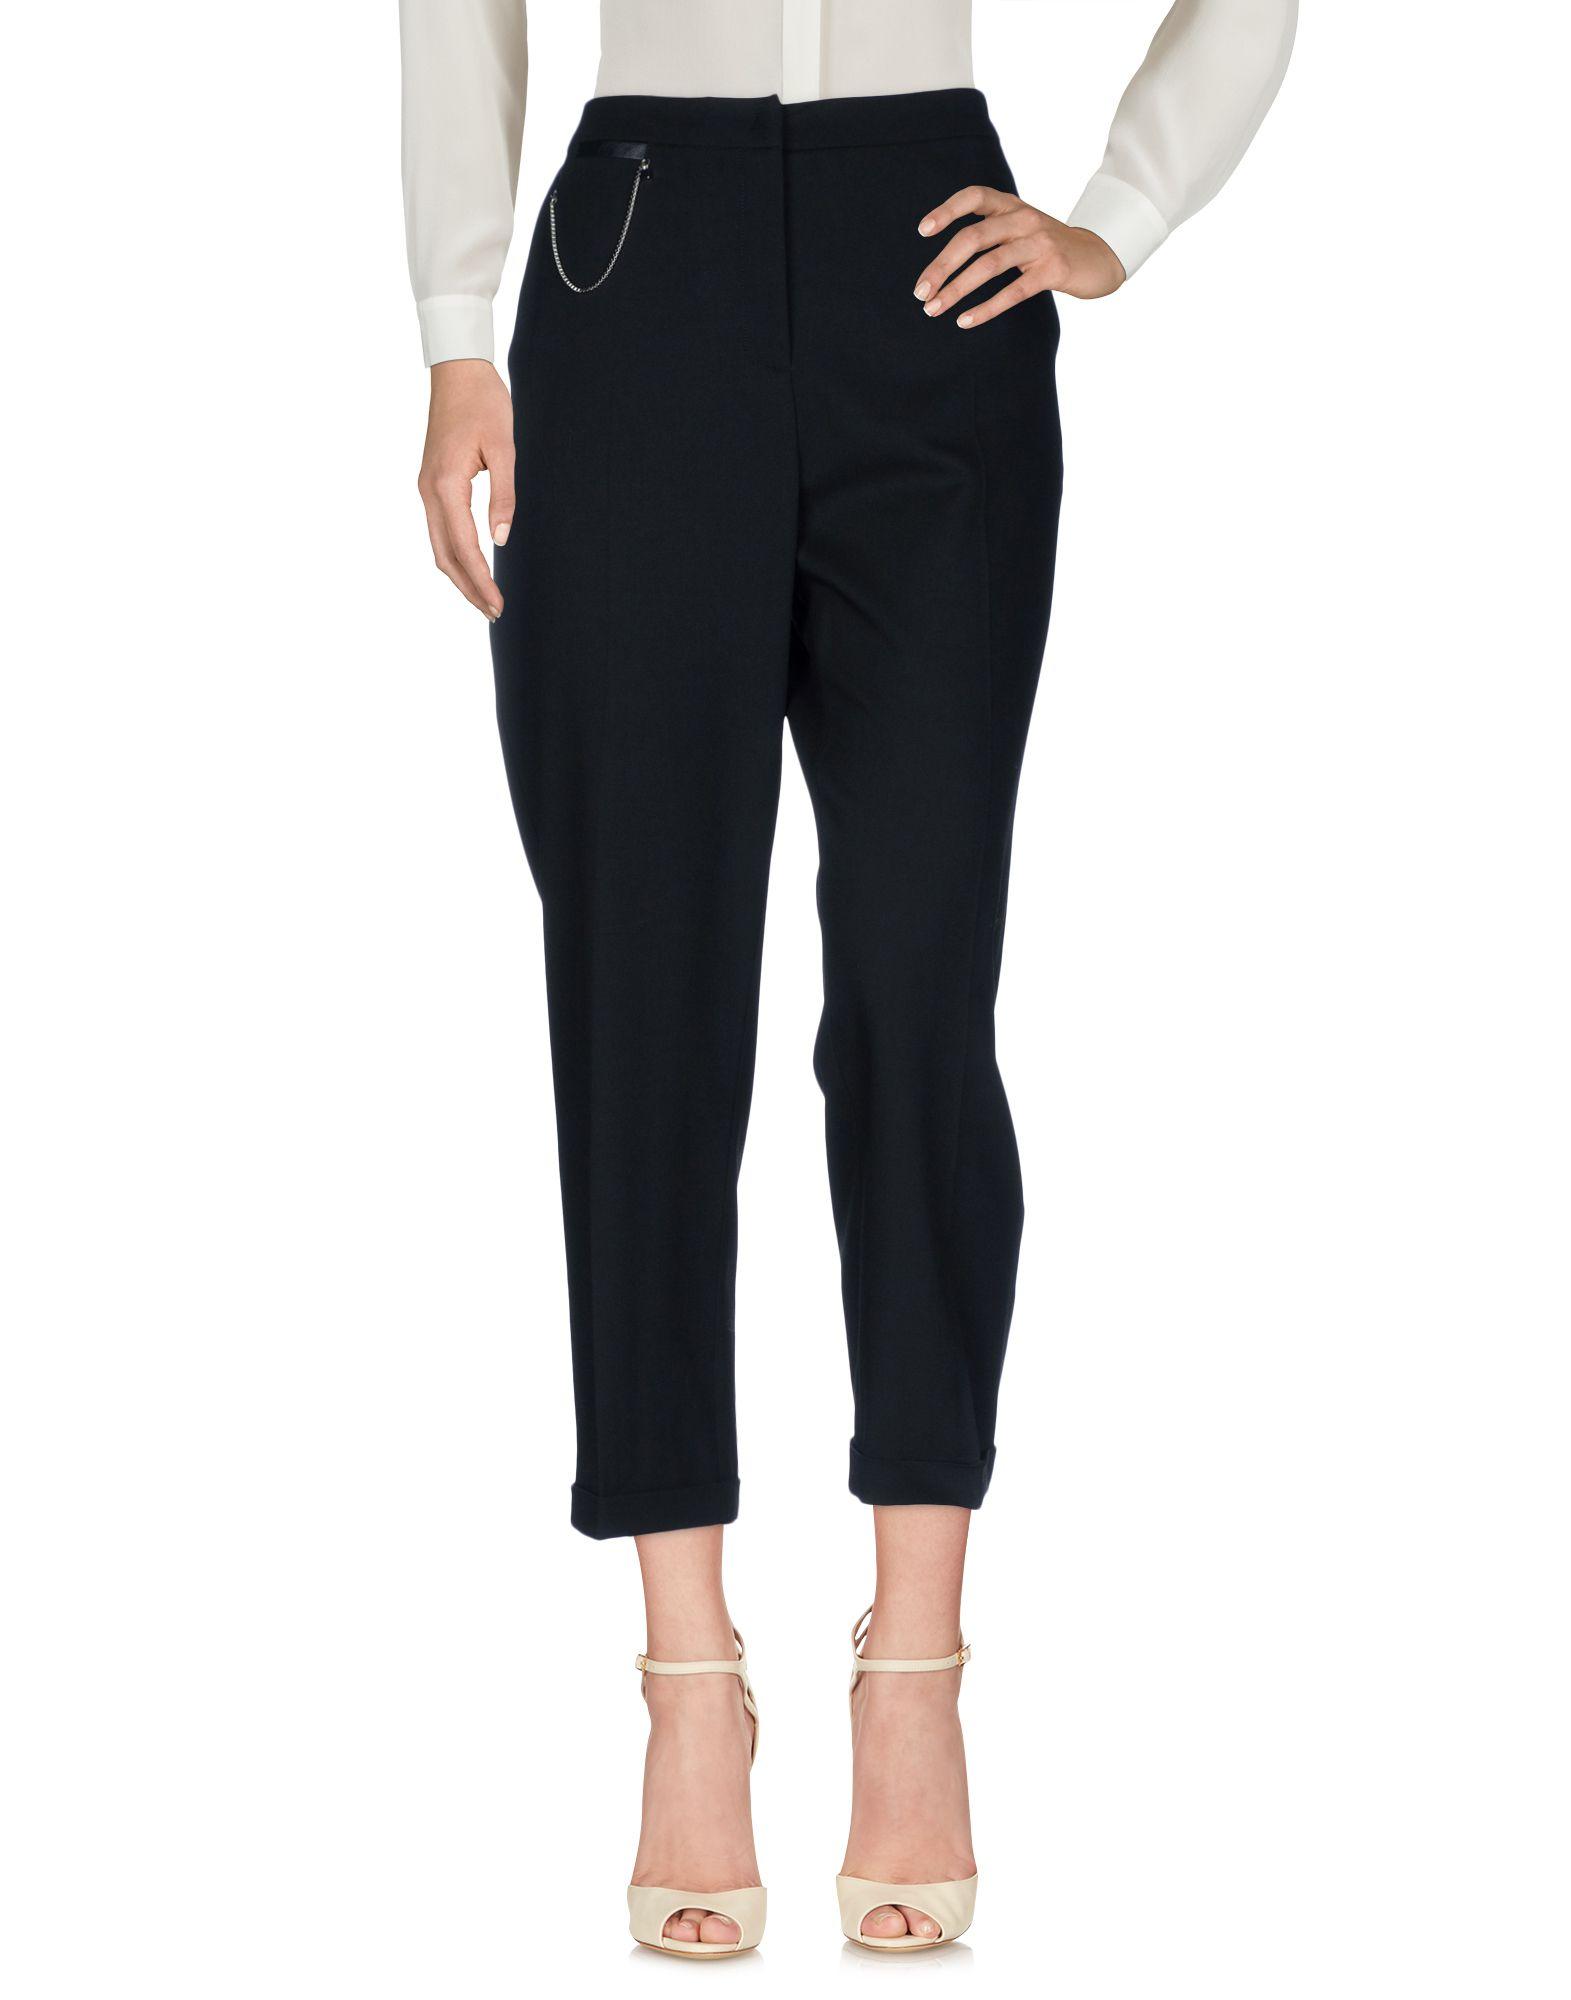 Pinko Pantalon En À FemmesAcheter Ligne WHD9E2I